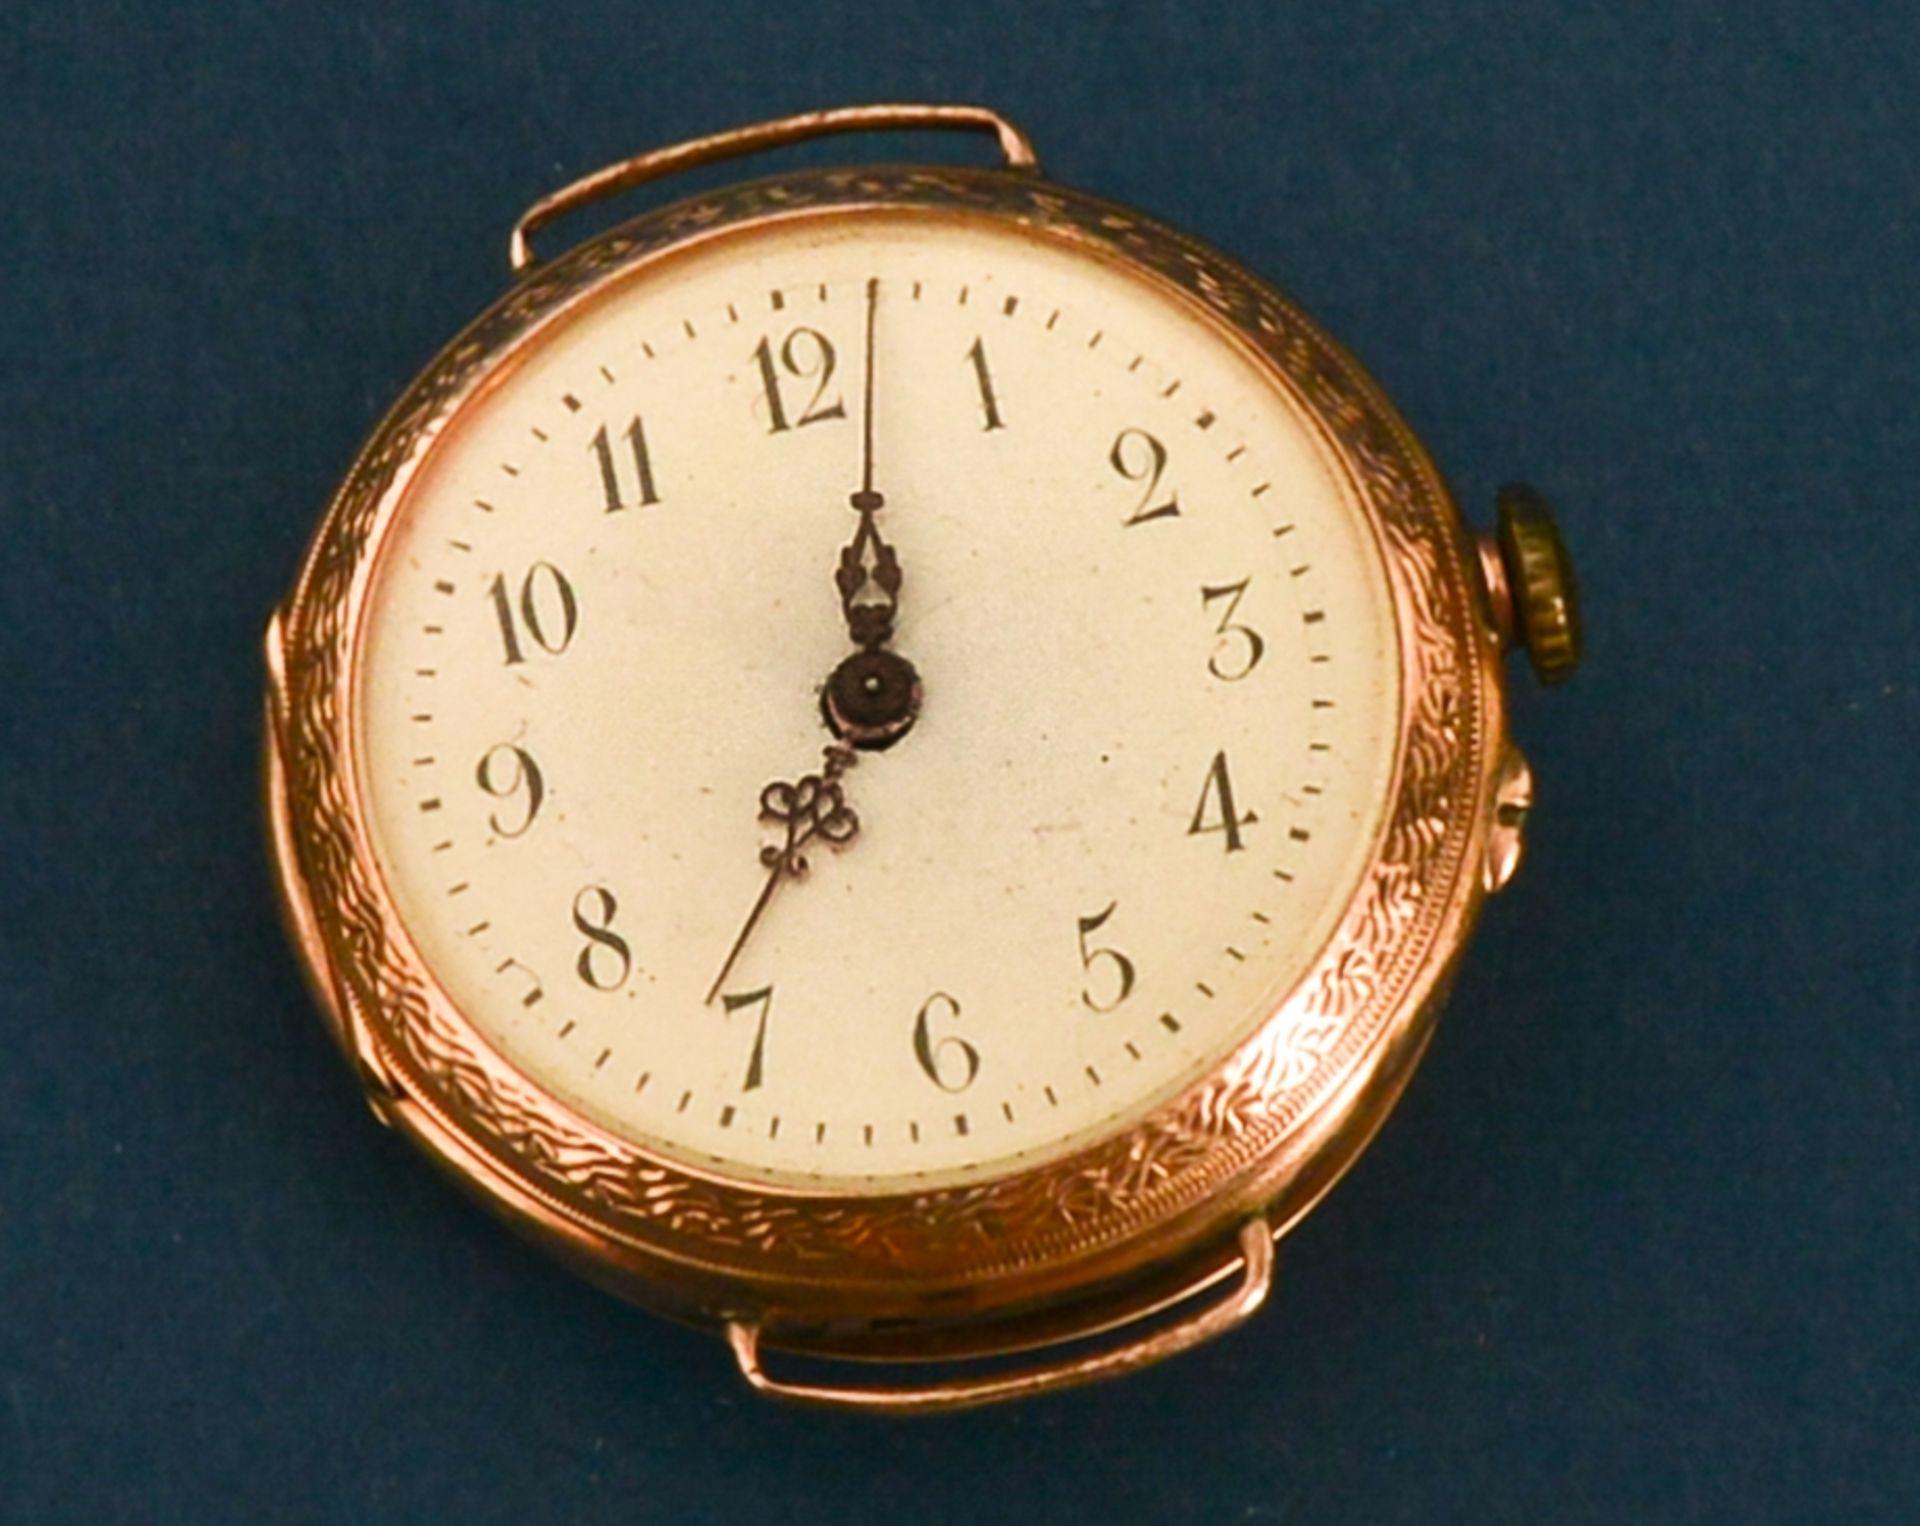 Frühe Damenarmbanduhr, um 1900. Aufwändig gestaltetes 585er Gelbgoldgehäuse, Durchmesser ca. 30